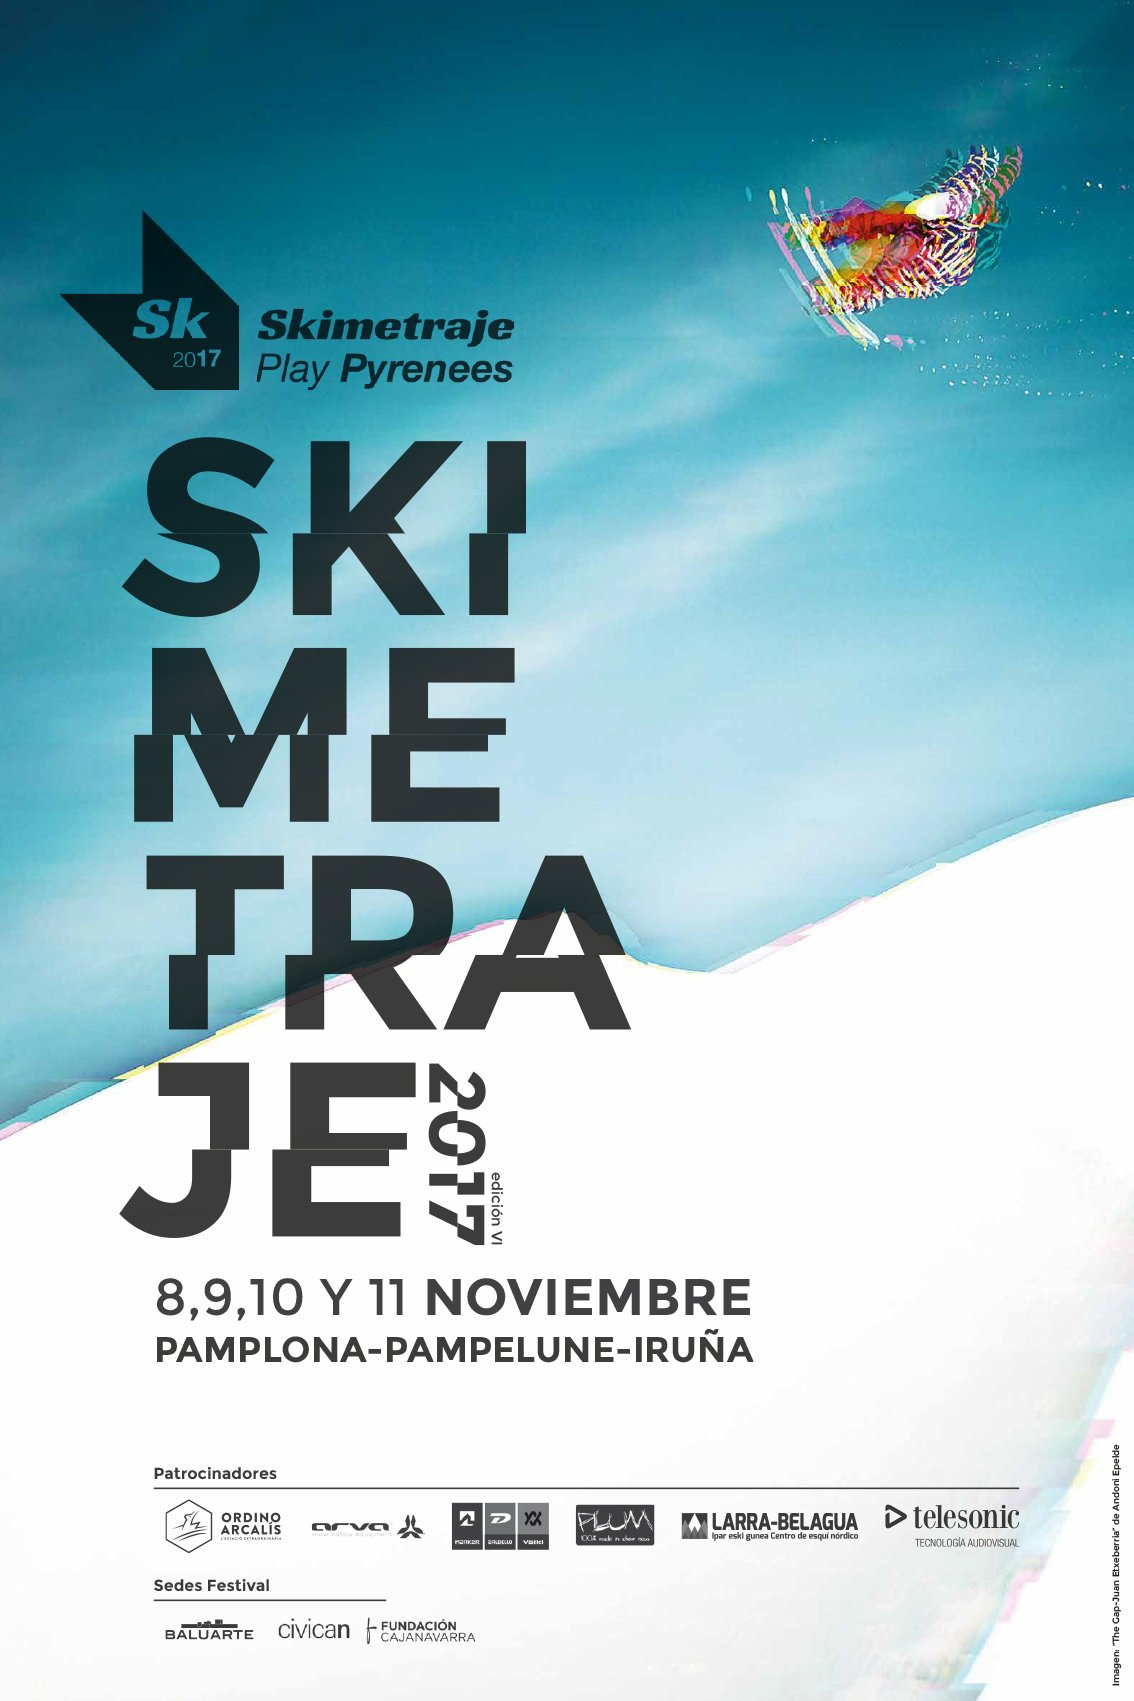 Ya están a la venta las entradas de Skimetraje 2017